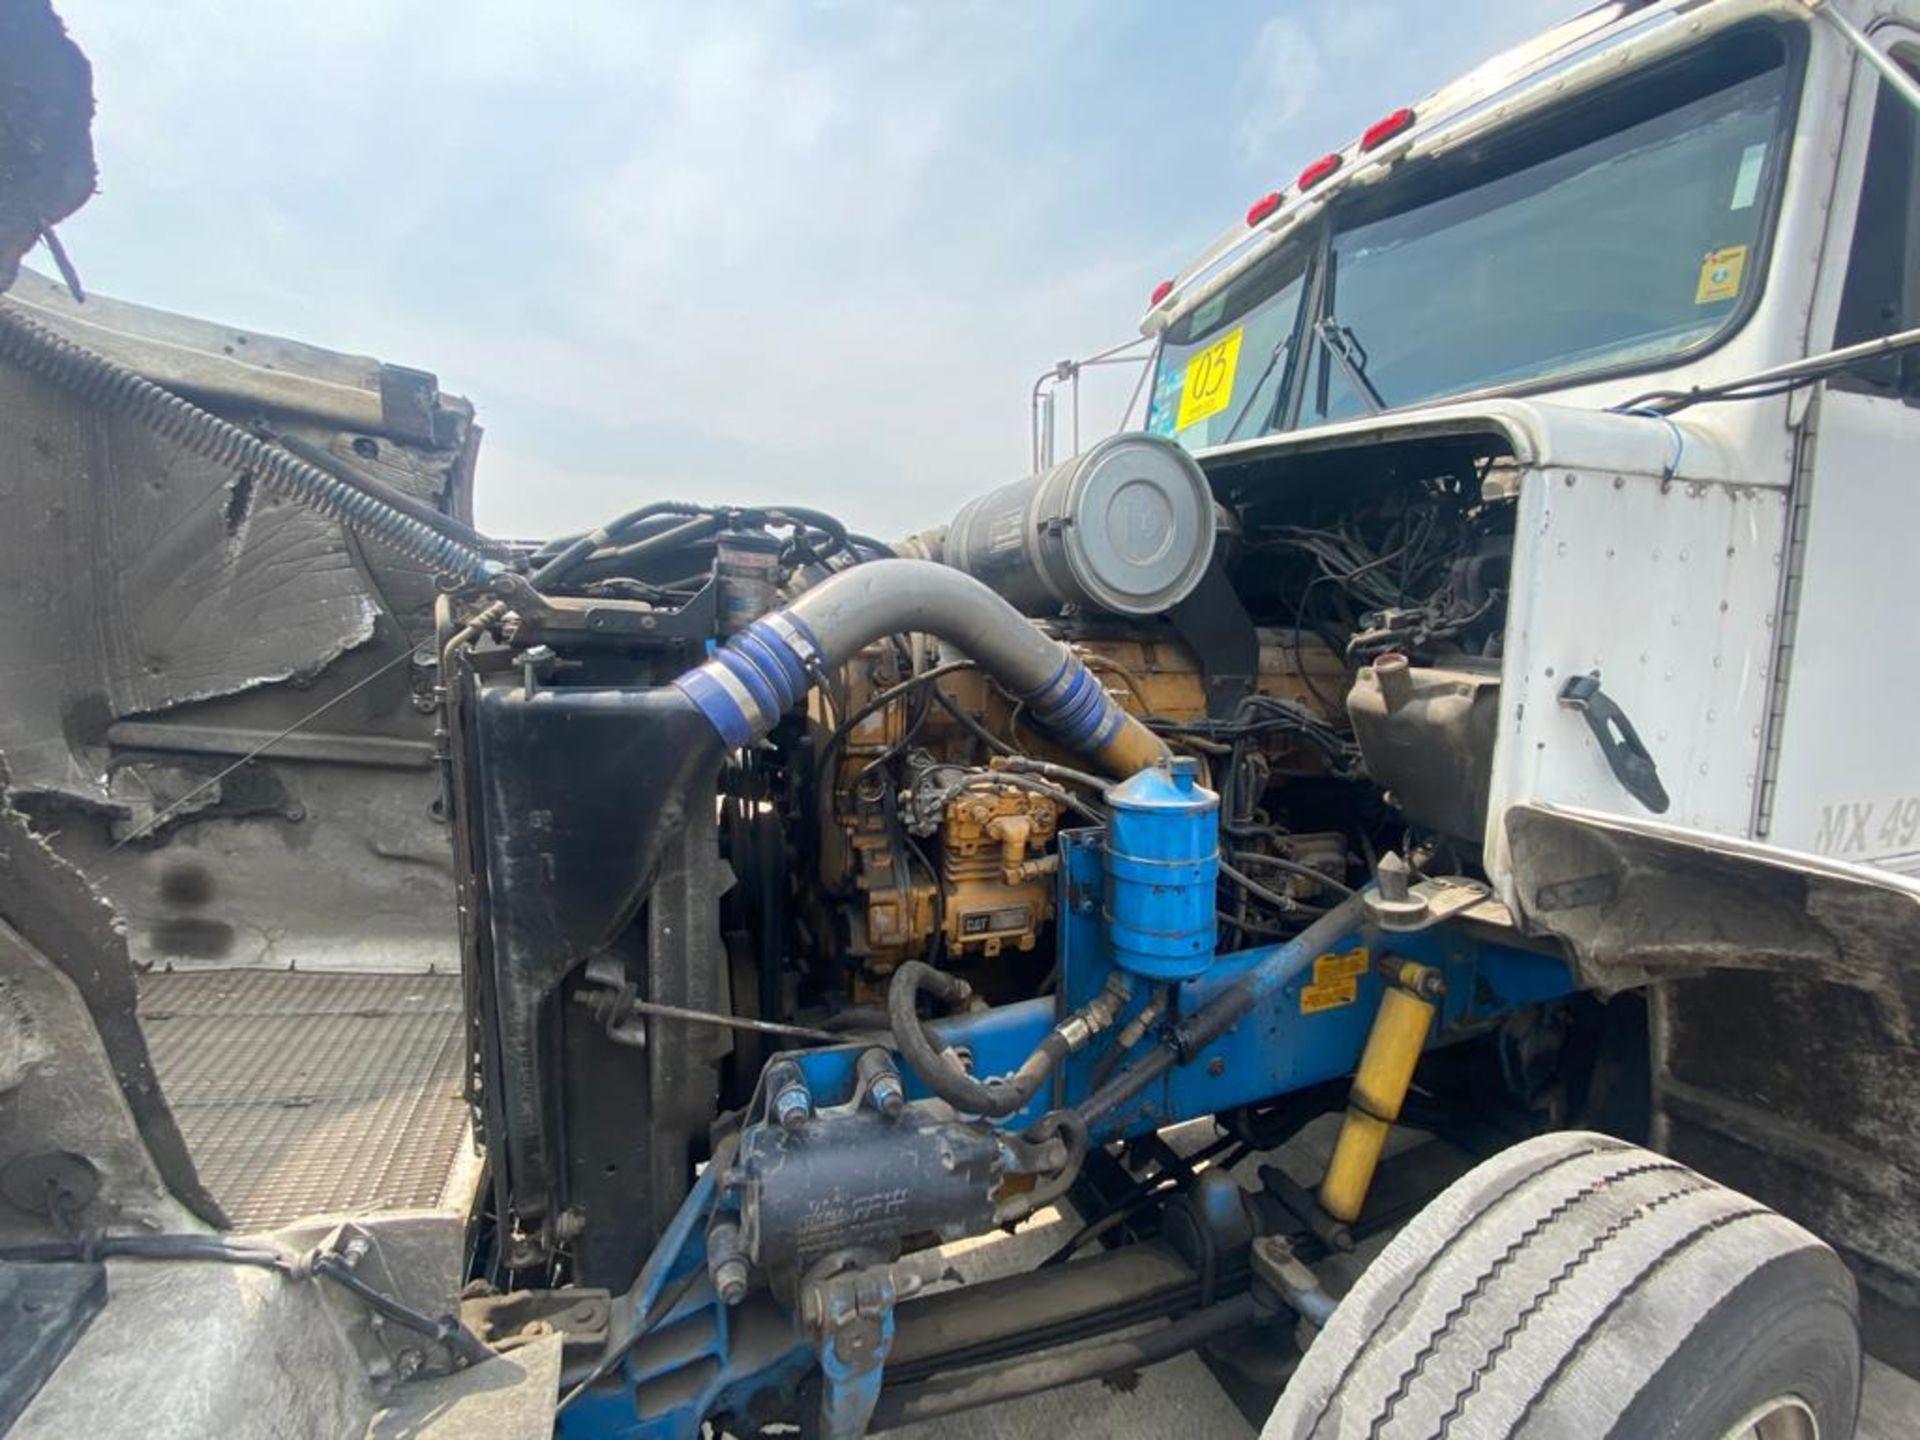 1999 Kenworth Sleeper truck tractor, standard transmission of 18 speeds - Image 58 of 62